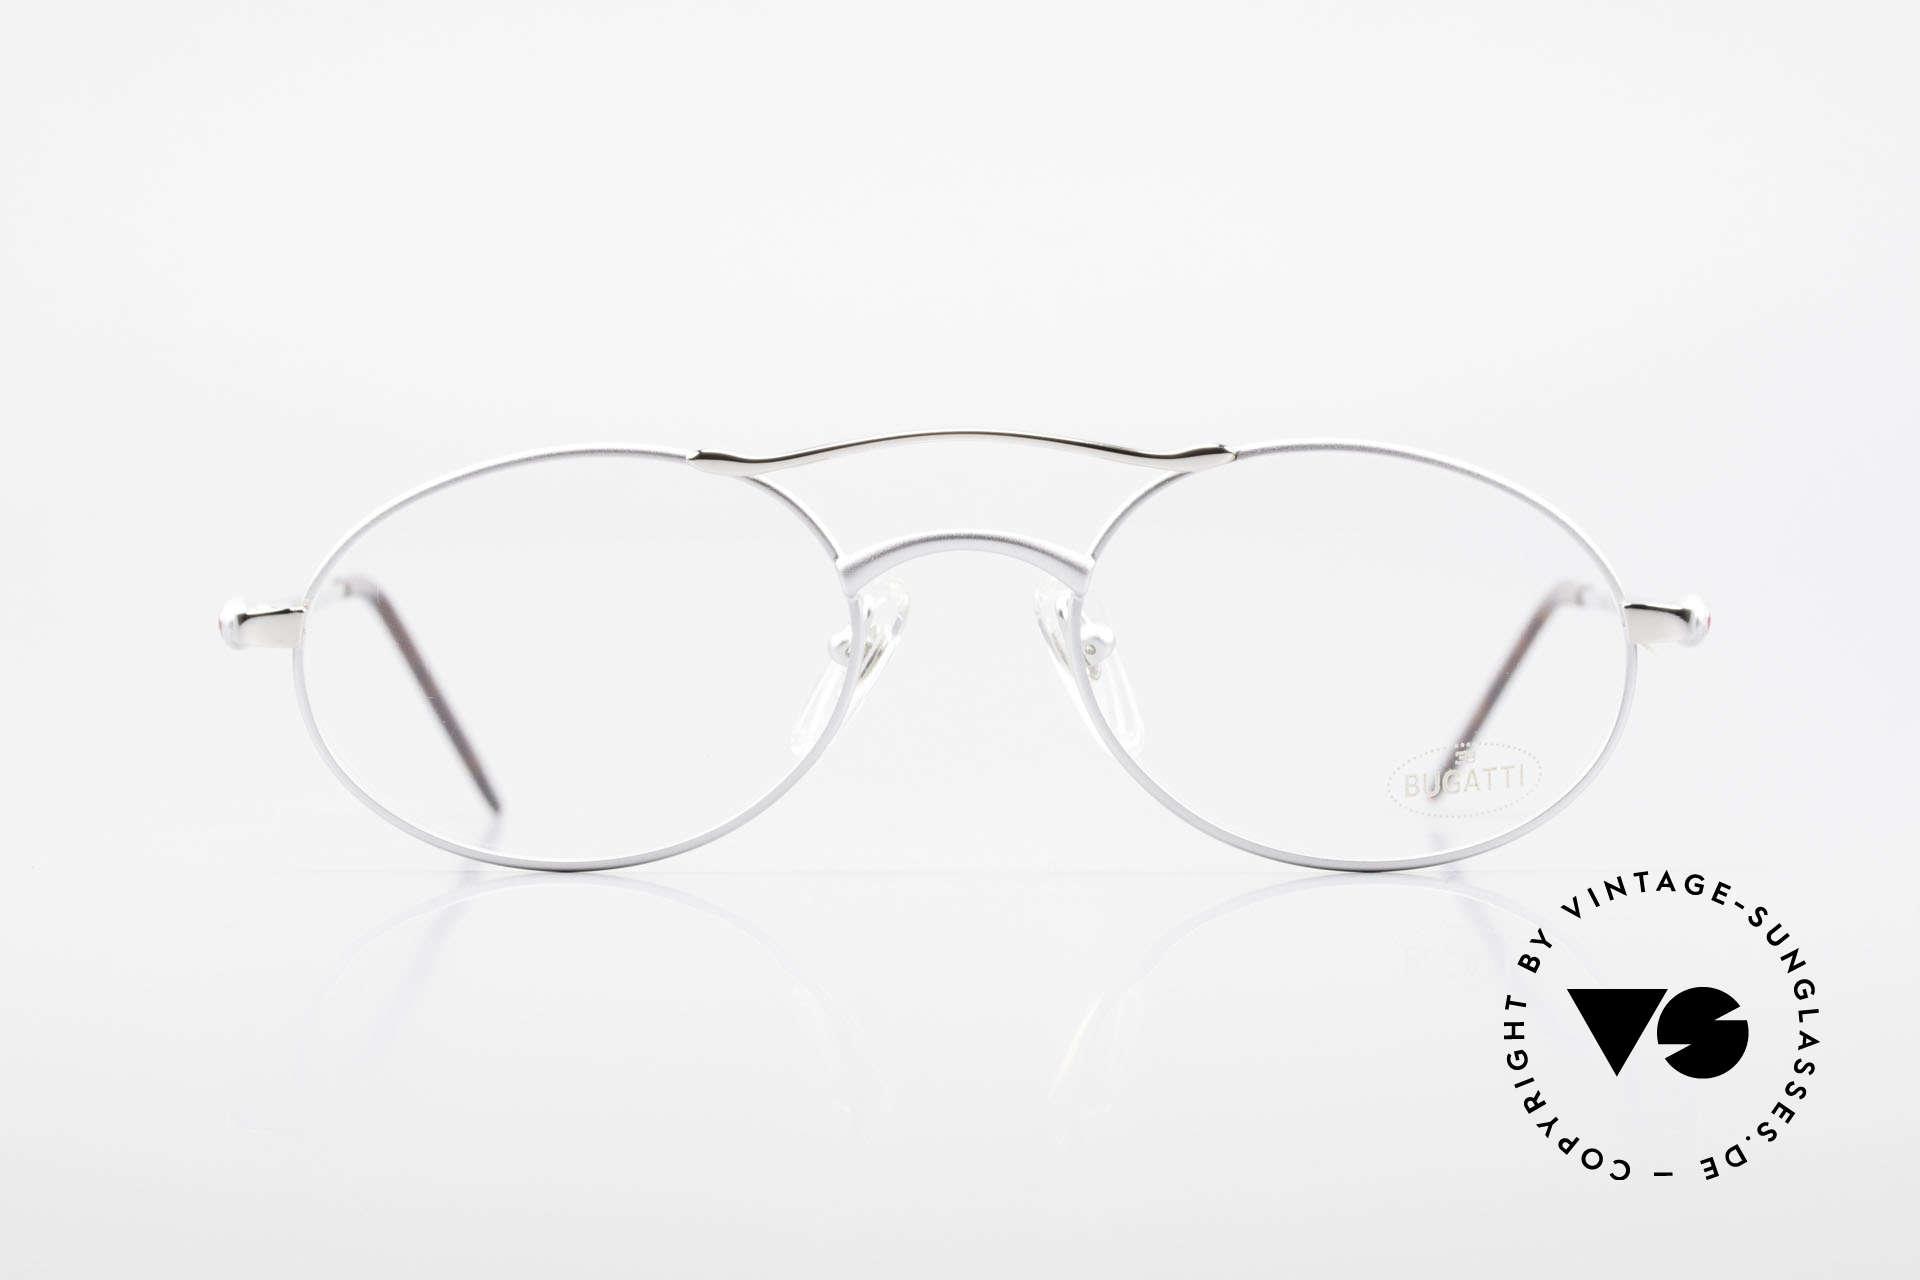 Bugatti 26540 Men's 90's Luxury Eyeglasses, legendary 'tear drop' design by Bugatti of the 90s, Made for Men